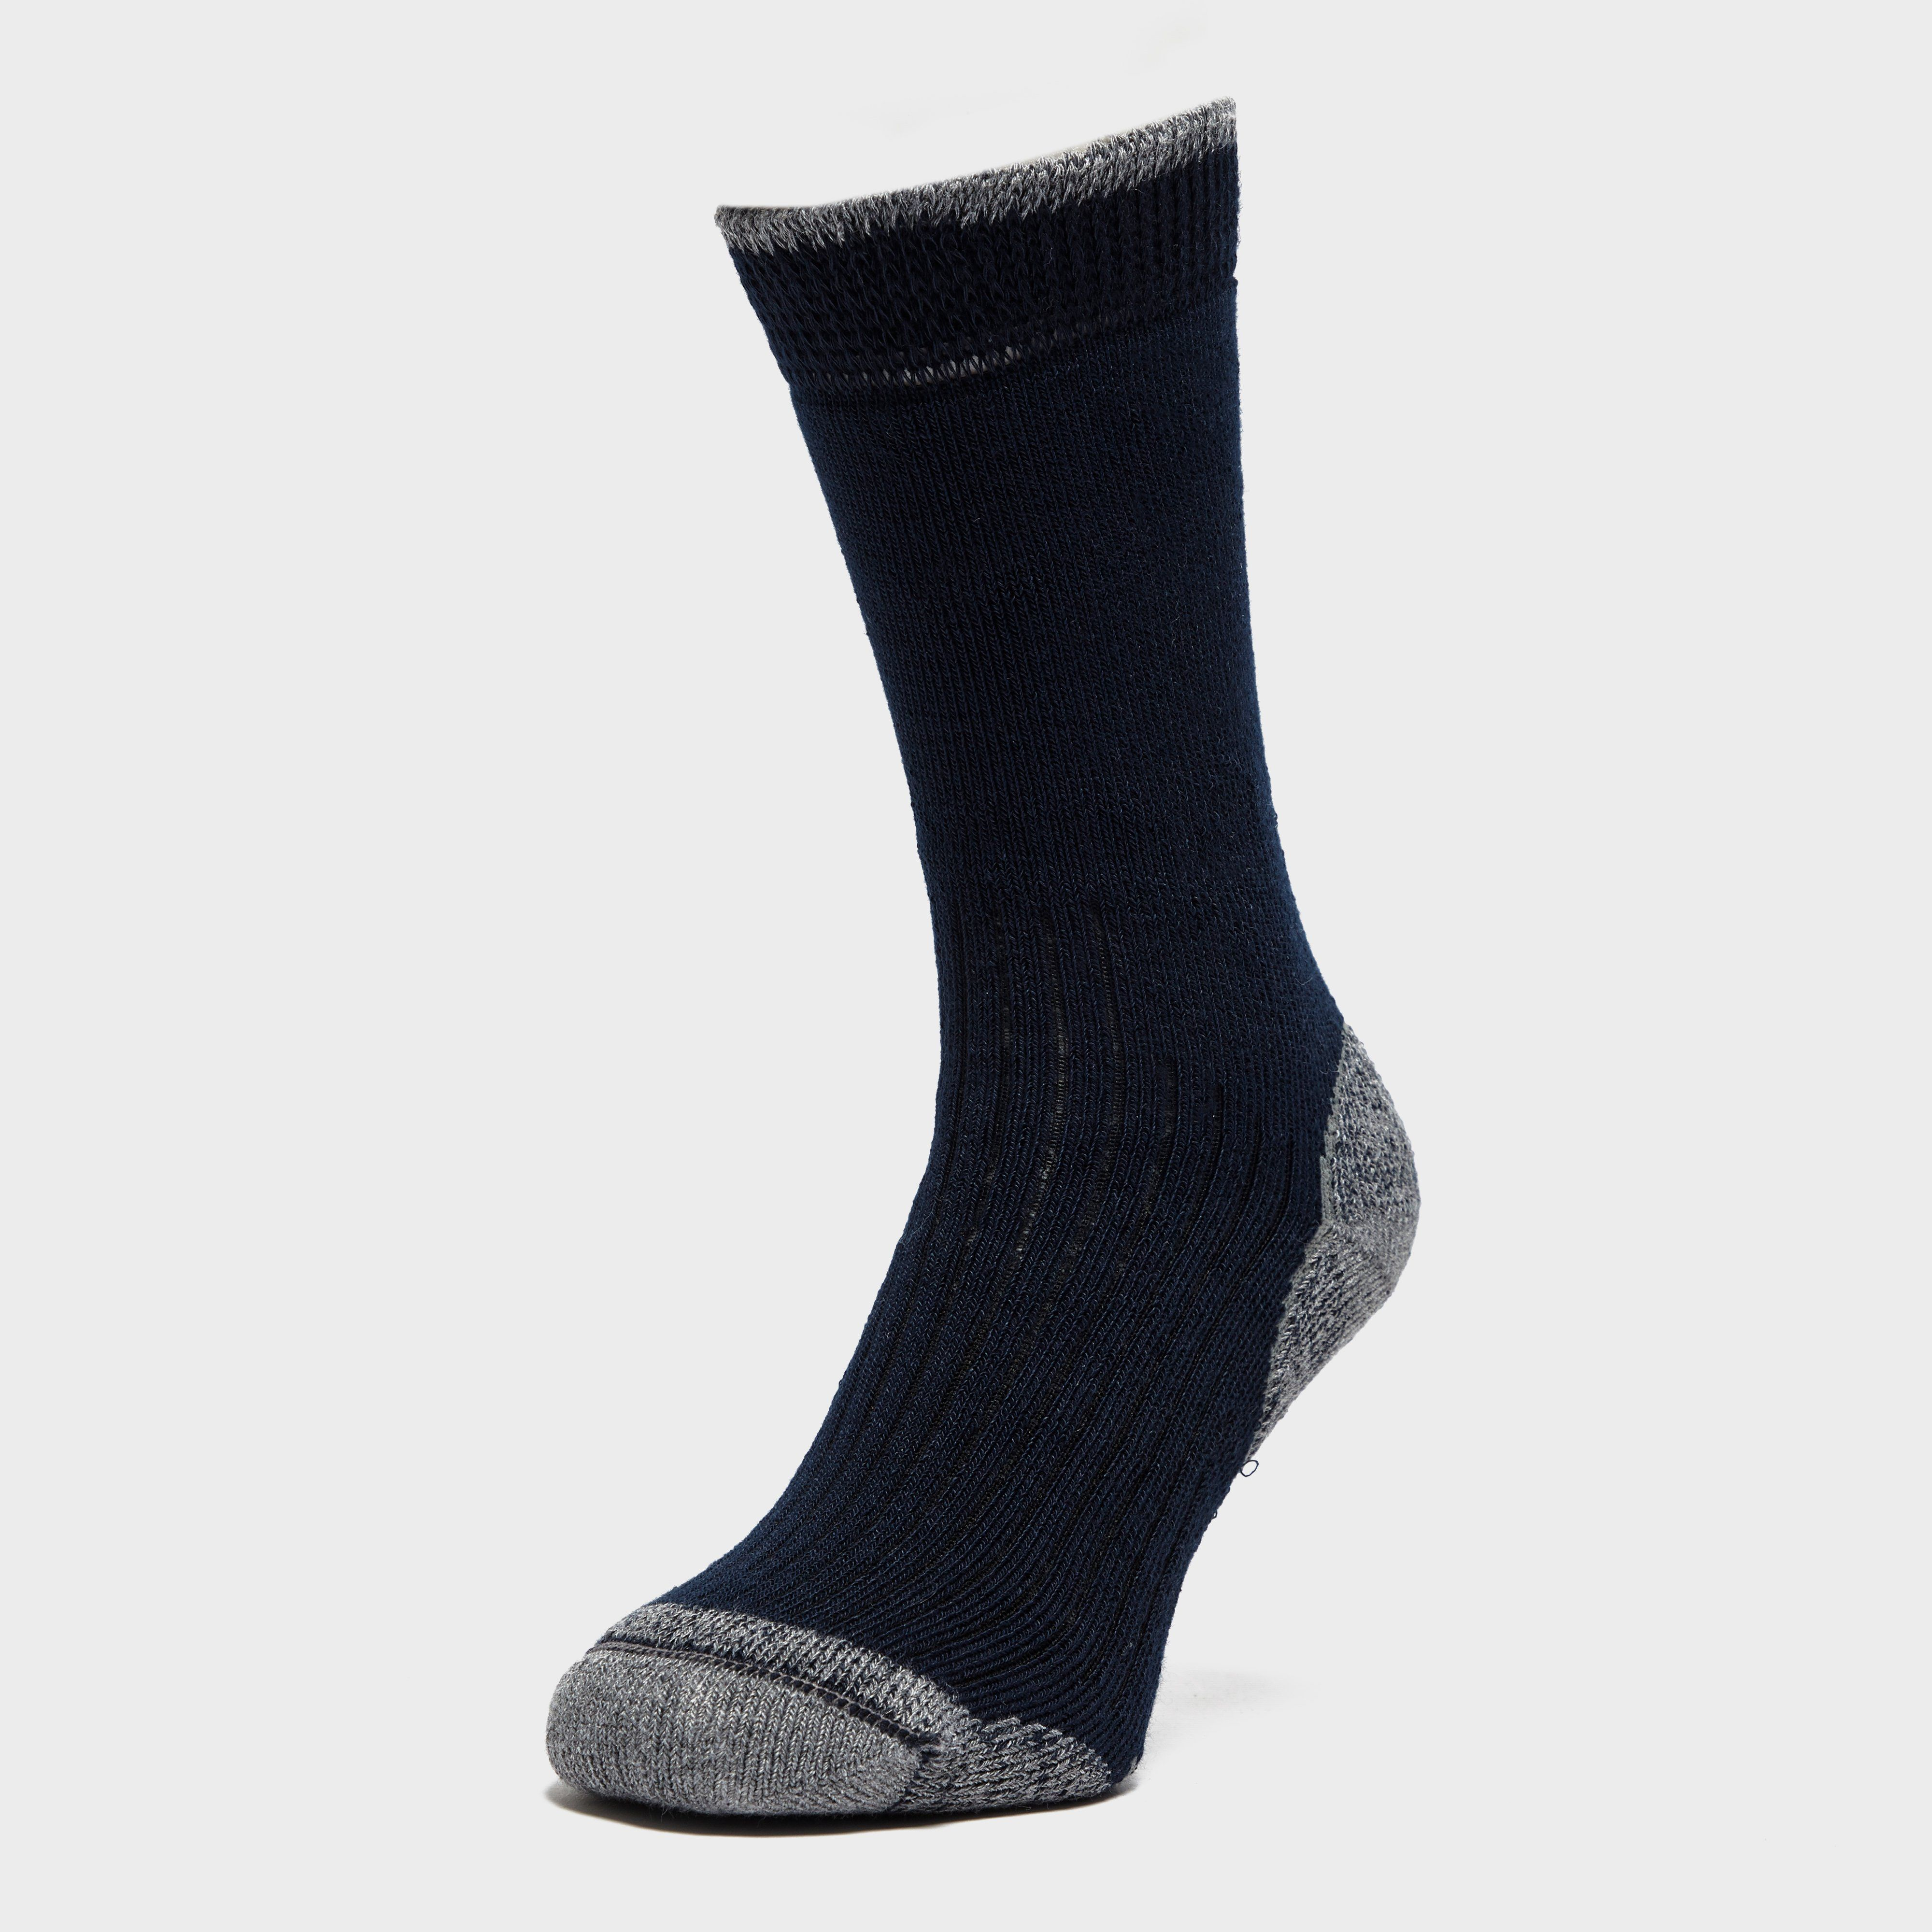 BRASHER Men's Hiker Crew Socks